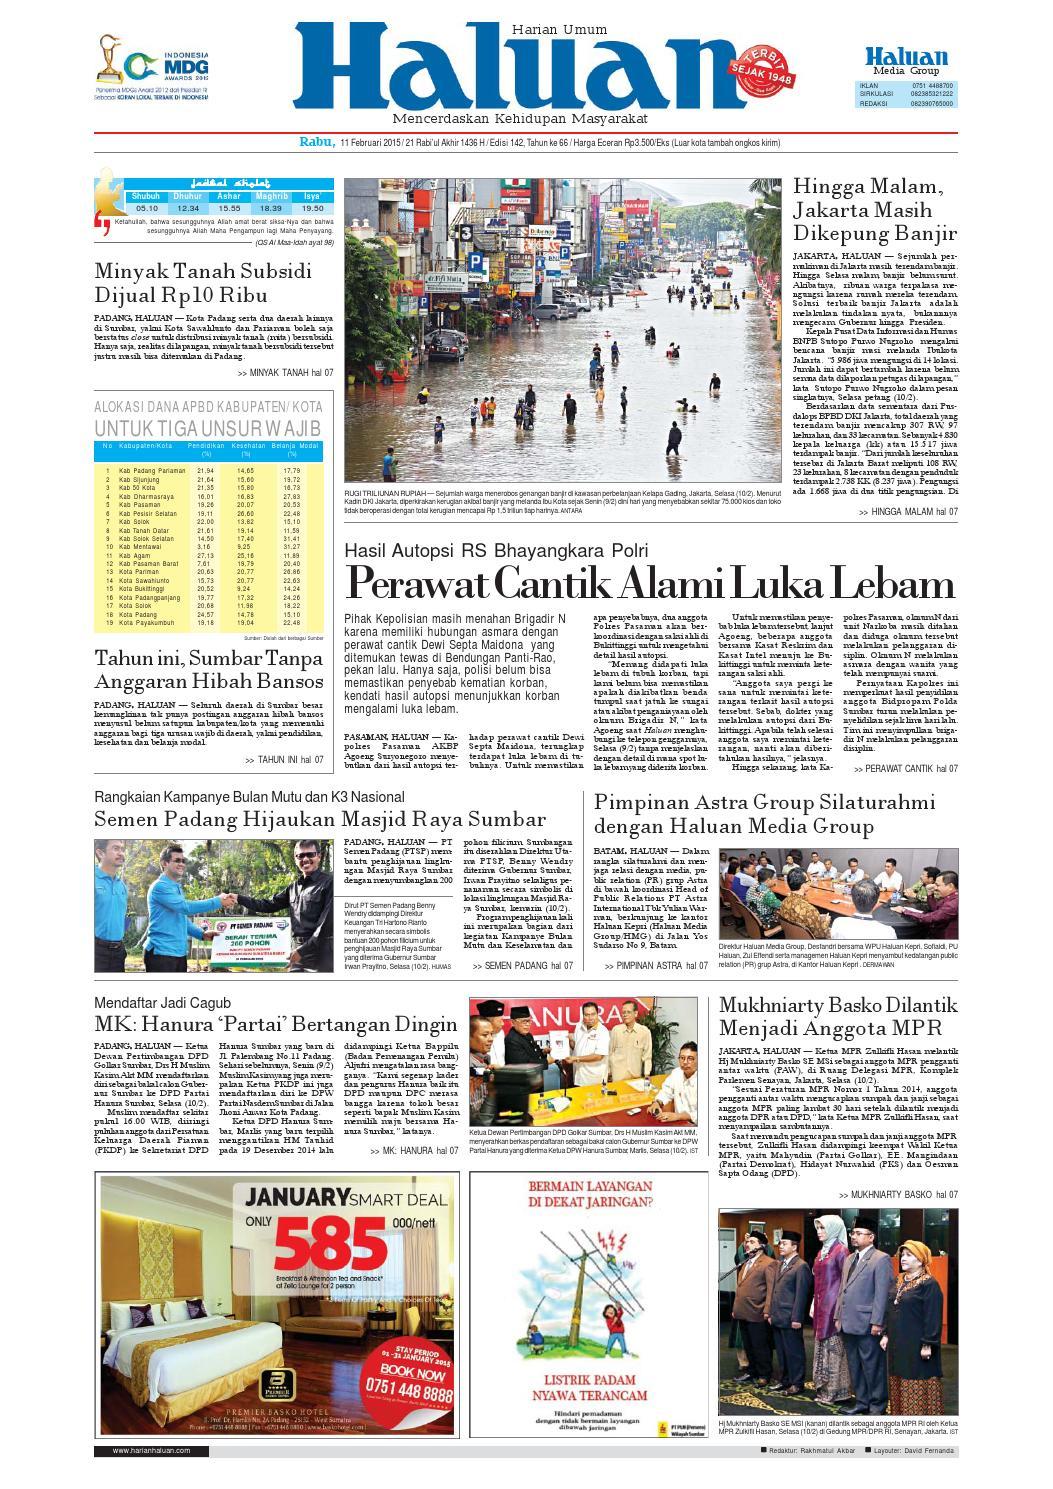 Haluan 11 Februari 2015 By Harian Issuu Kopi Bubuk Ridha Utama Smg